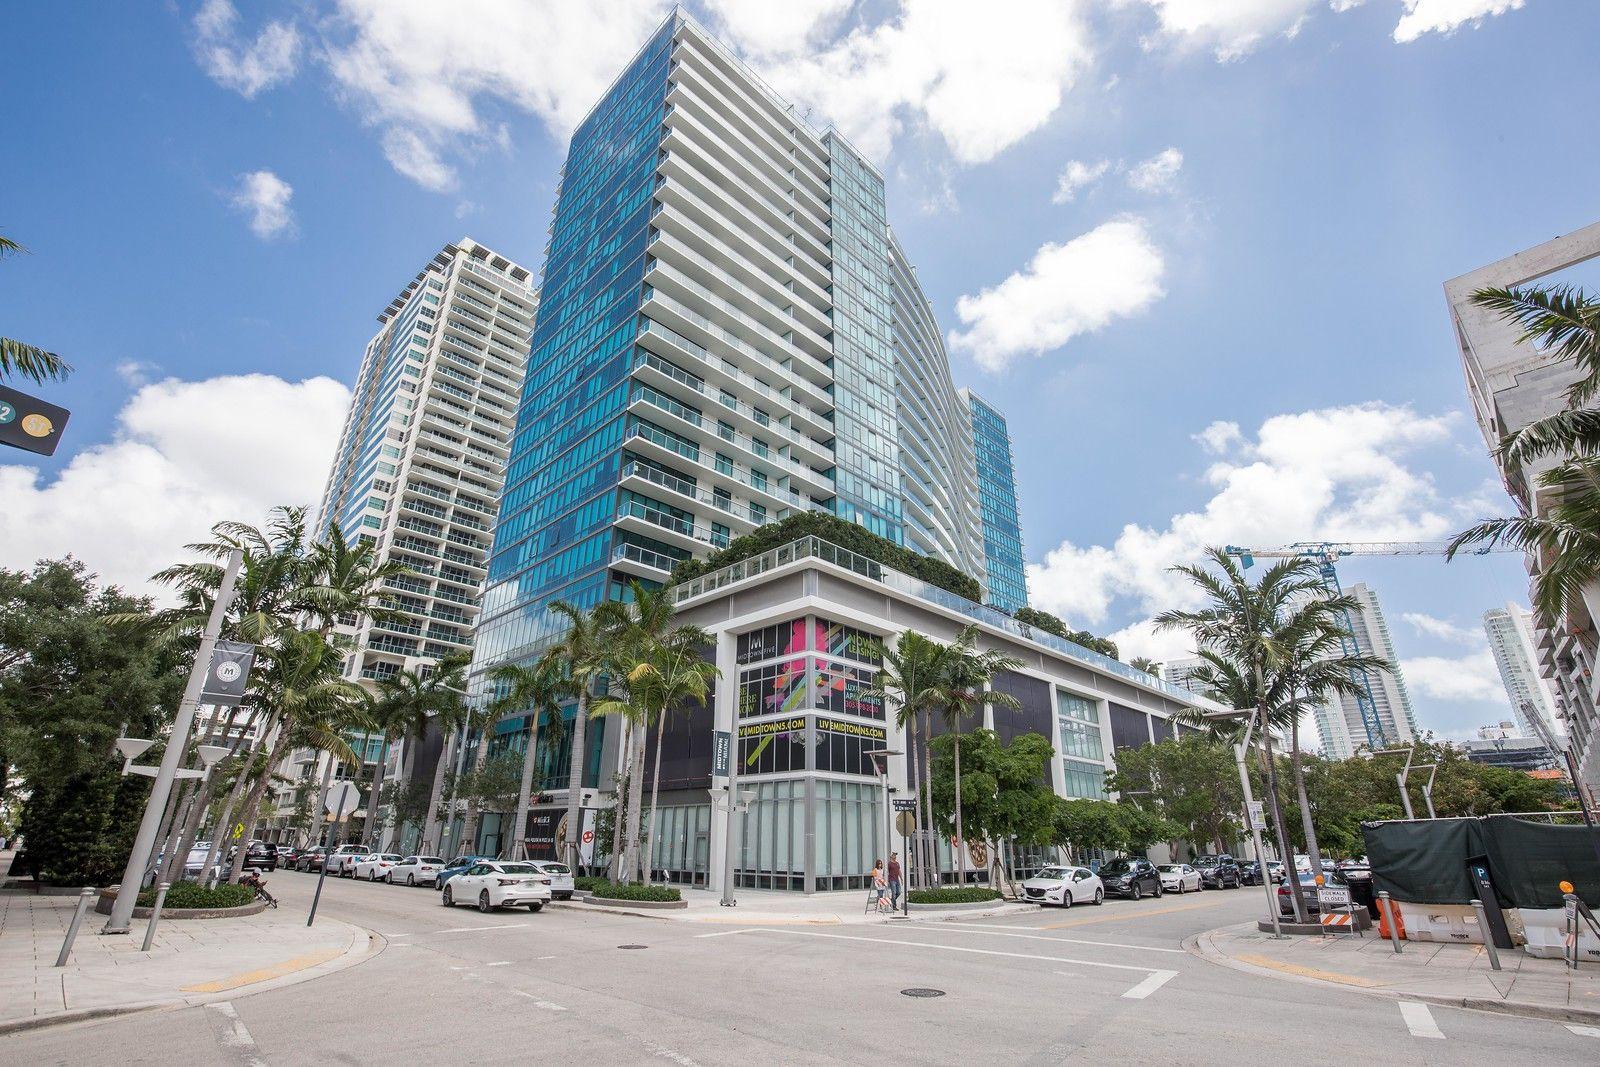 Miami Midtown 5 Tower Natural Ventilation Building Facade Aluminum Extrusion